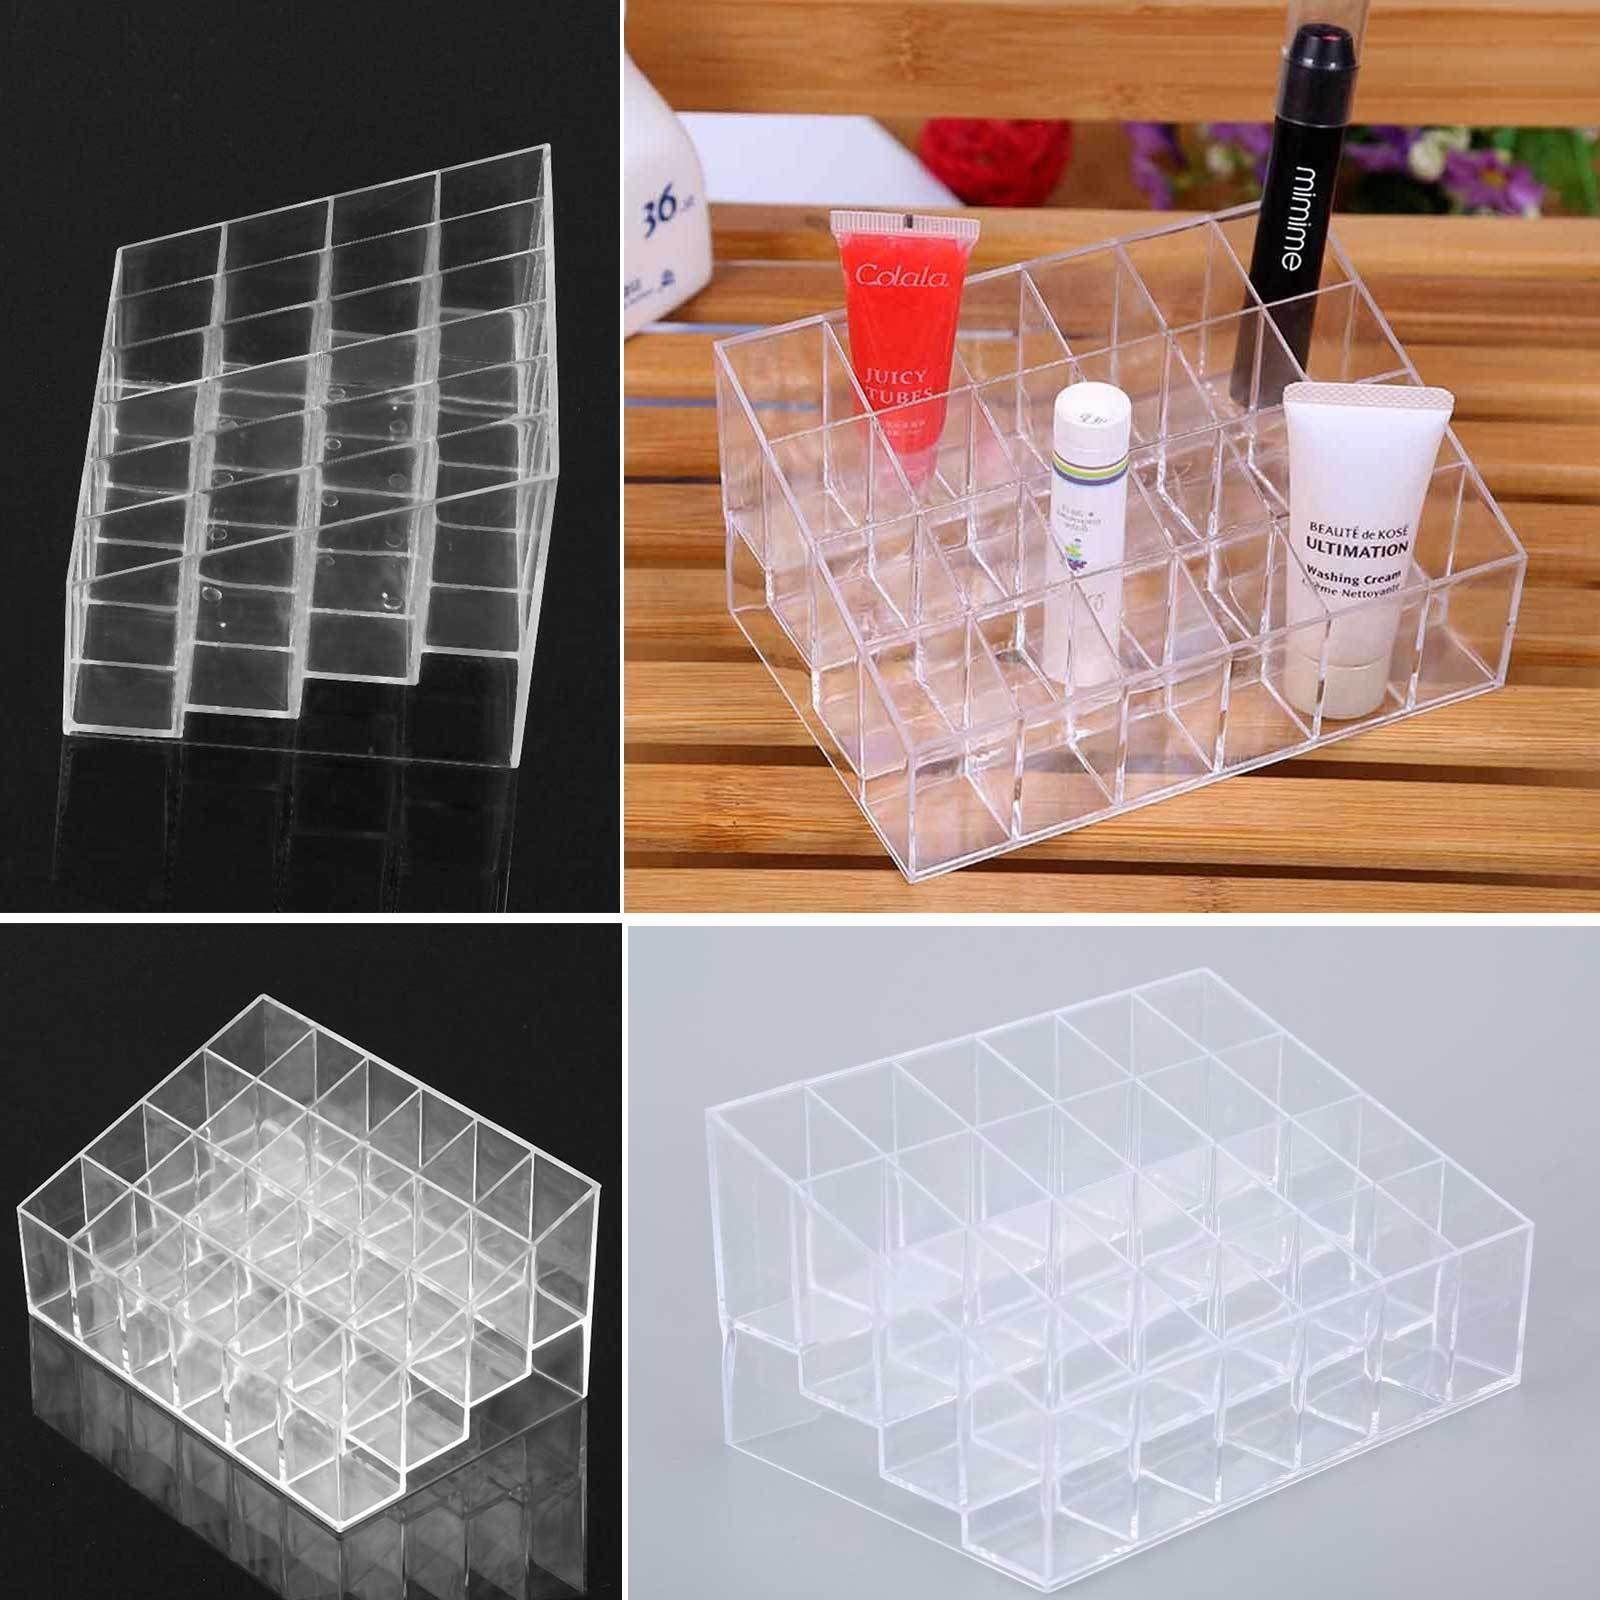 24 Makeup Cosmetic Lipstick Storage Display Stand Rack Holder Organizer